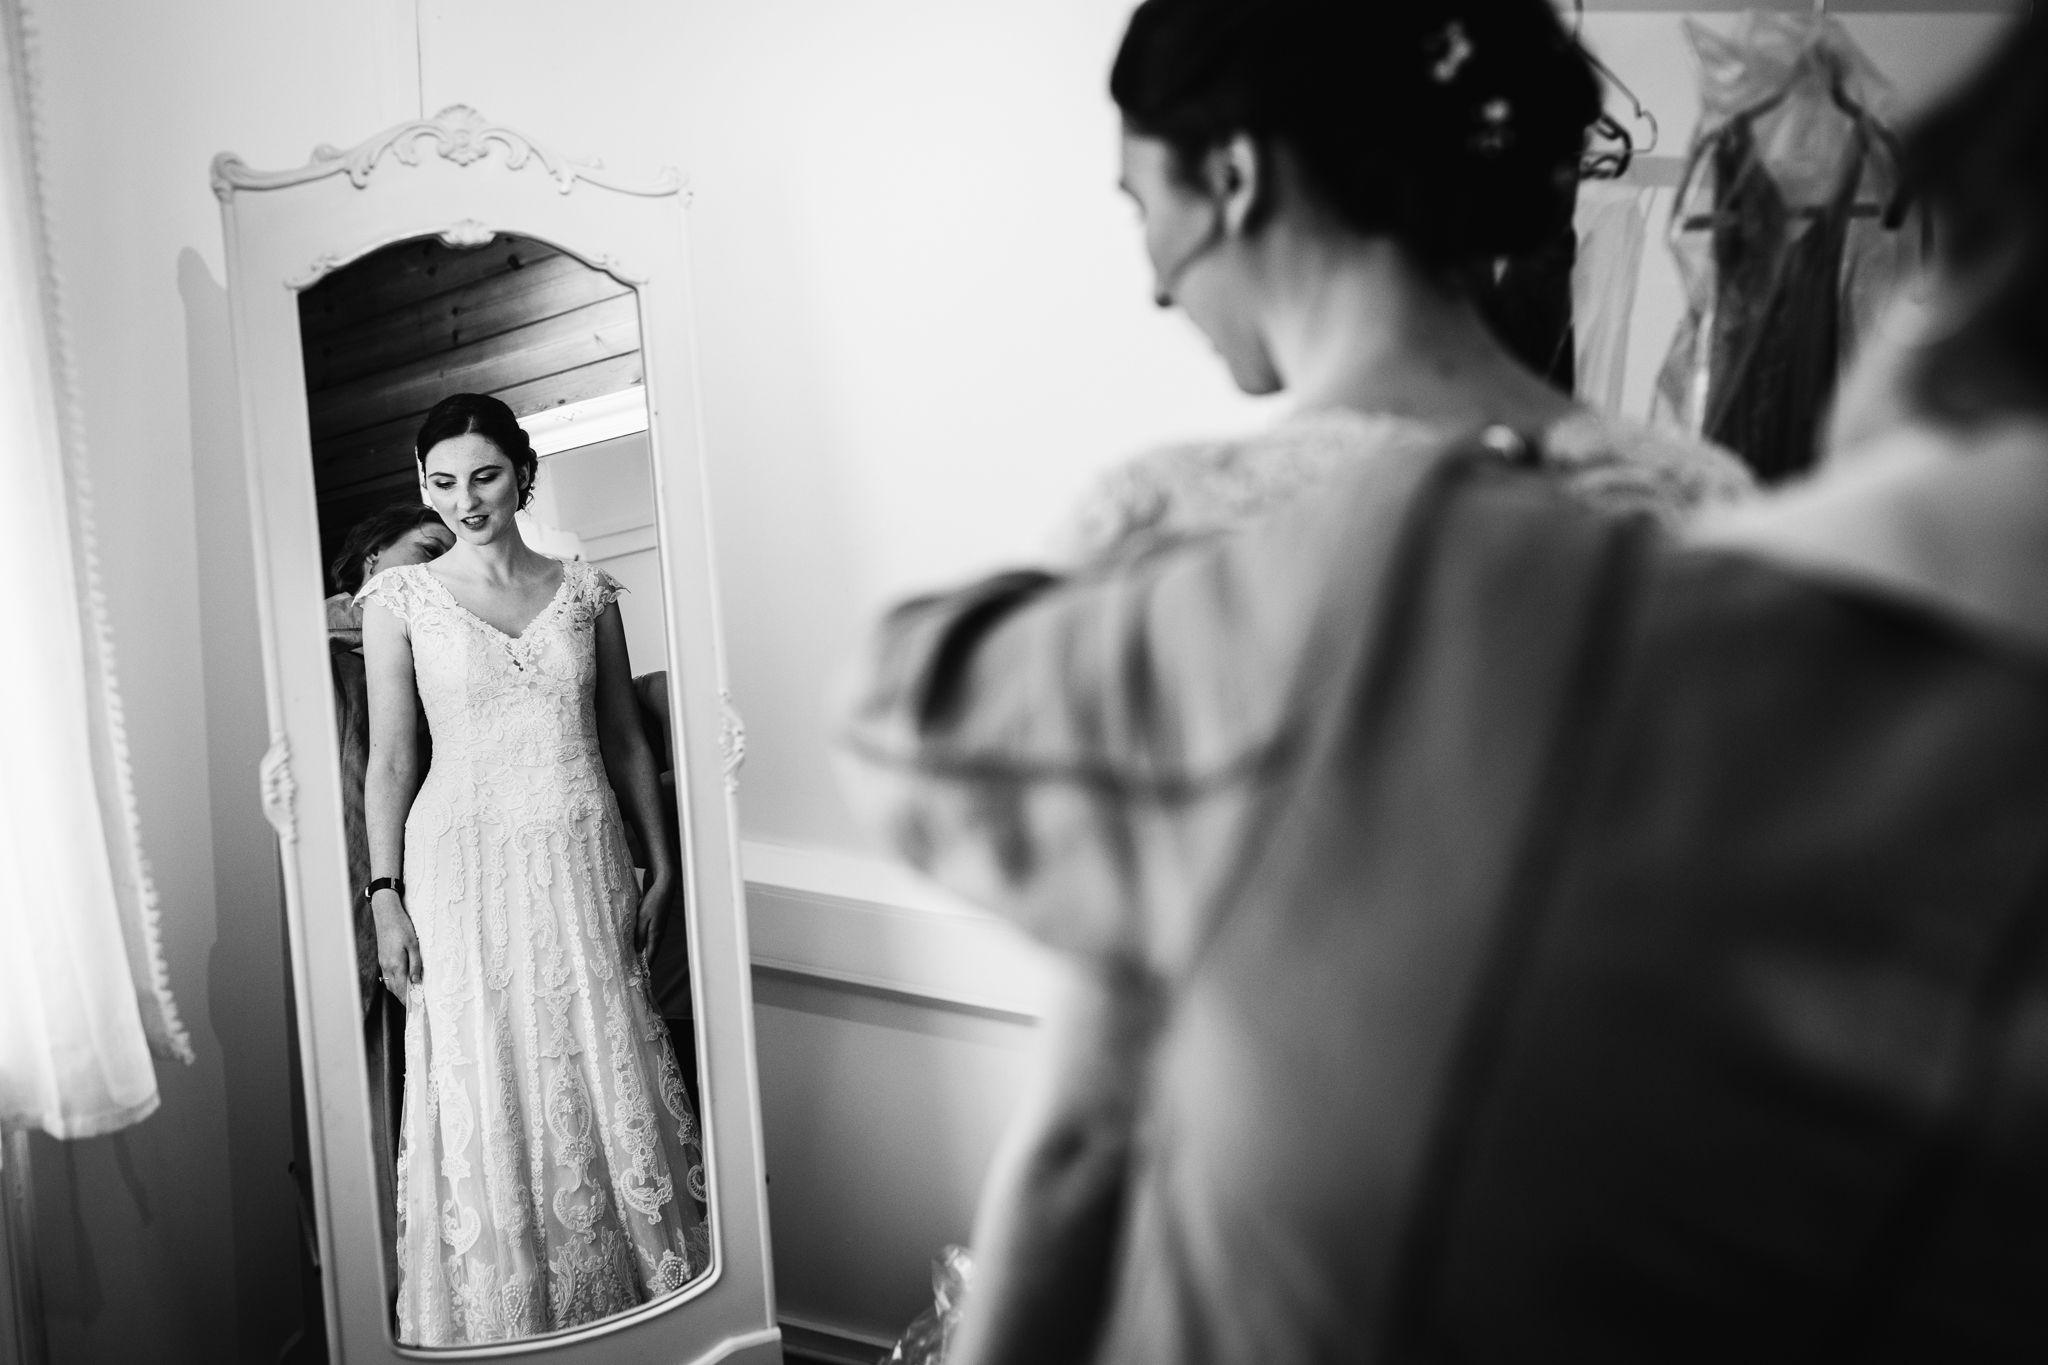 Bride putting on wedding dress in white mirror at Hayne House